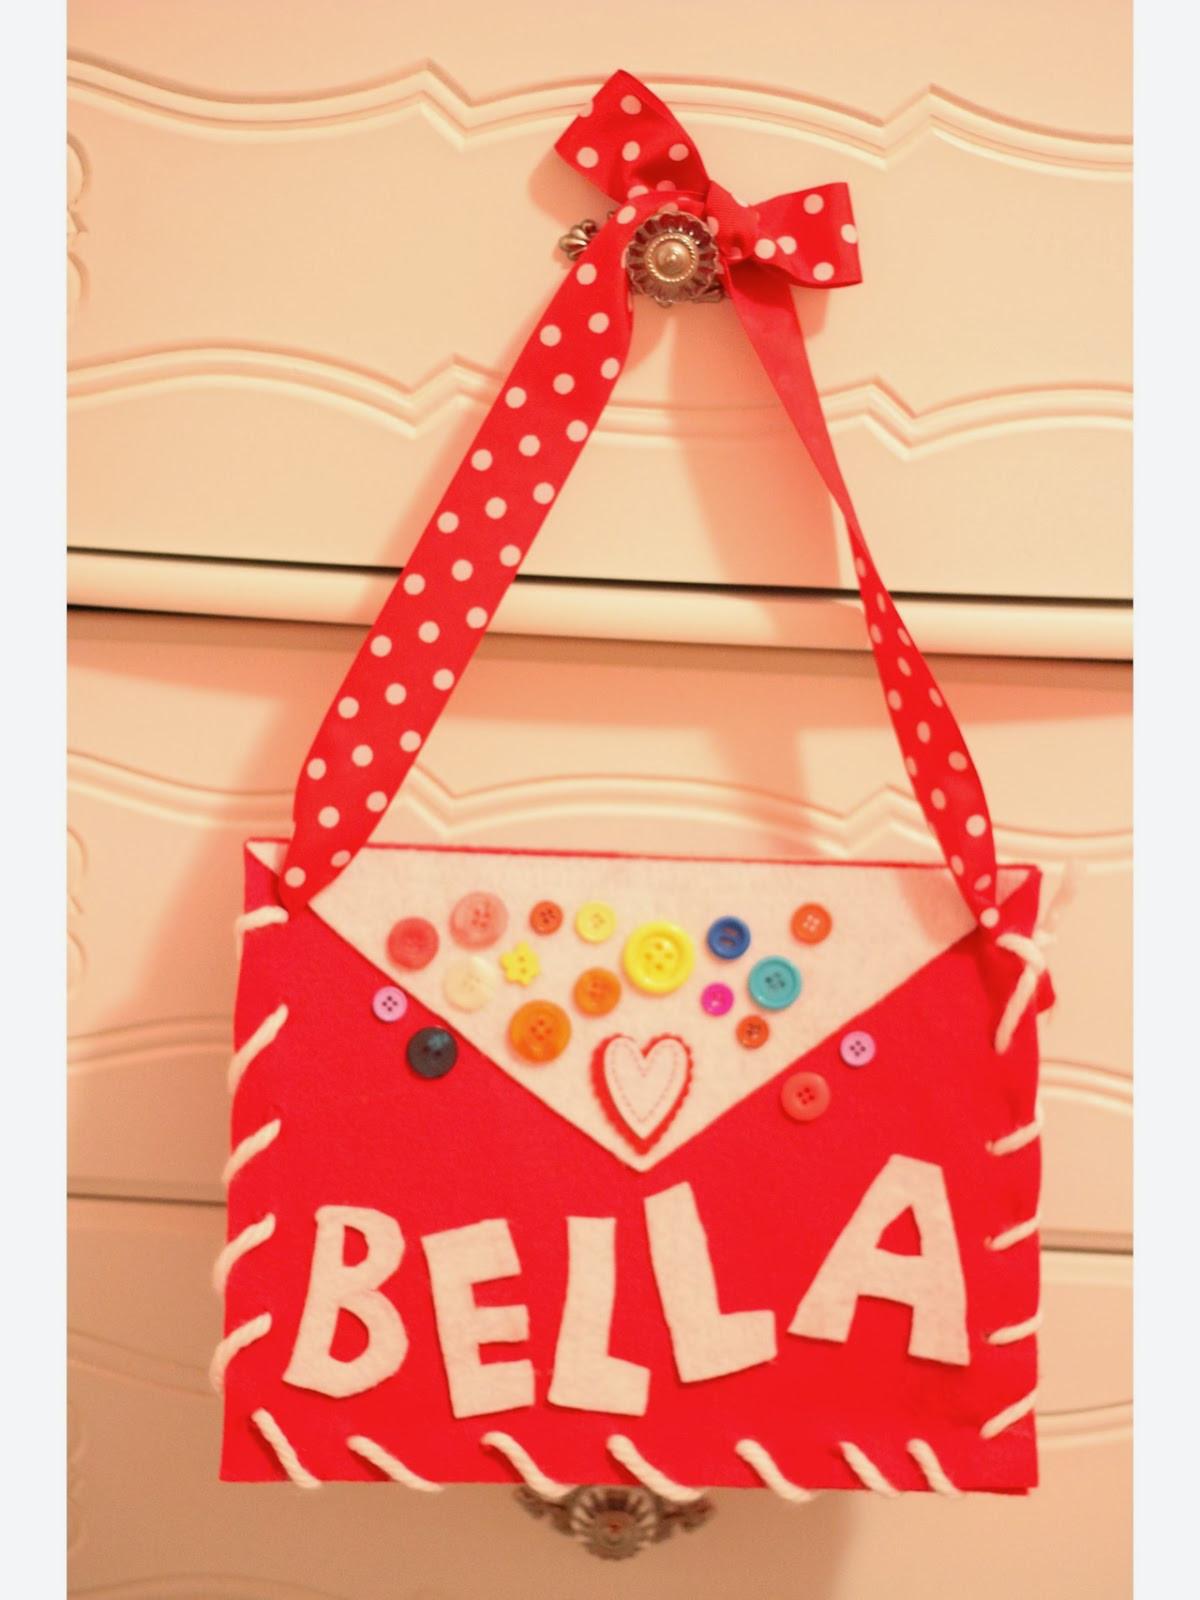 Best ideas about DIY Valentine Box . Save or Pin Teacher Creativity Blog Hop Valentine's Day craft and Now.